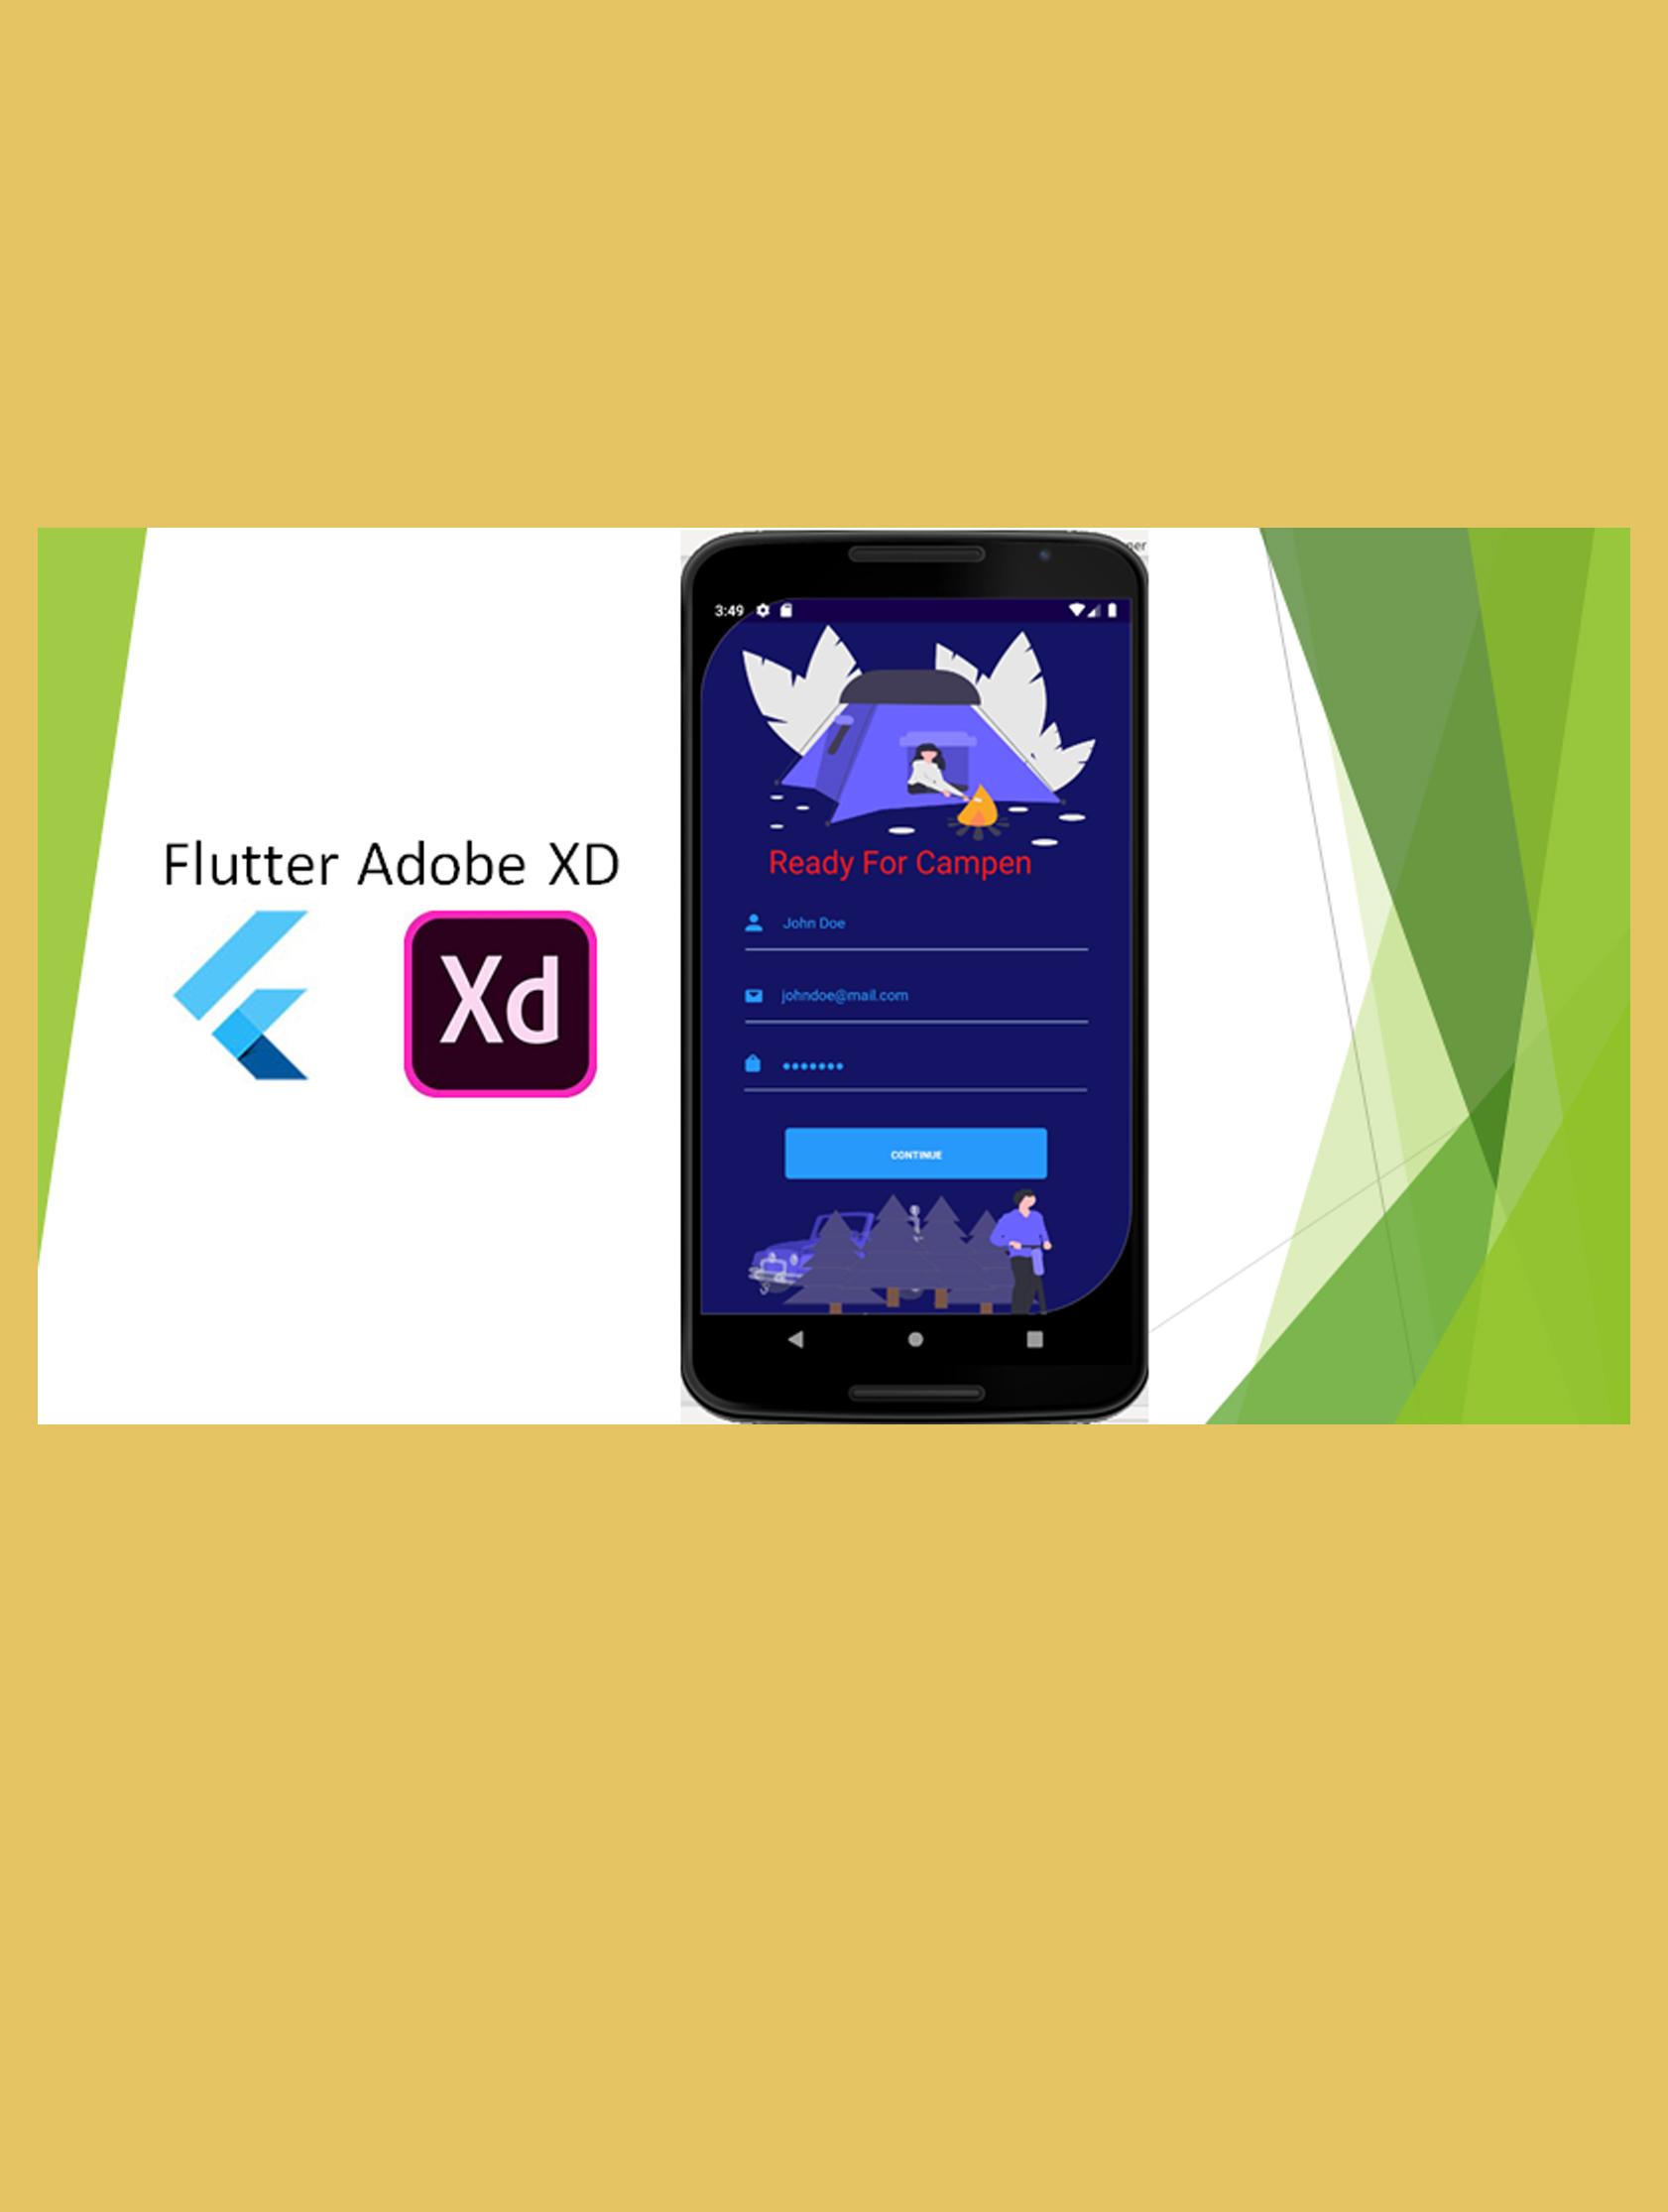 xd_app